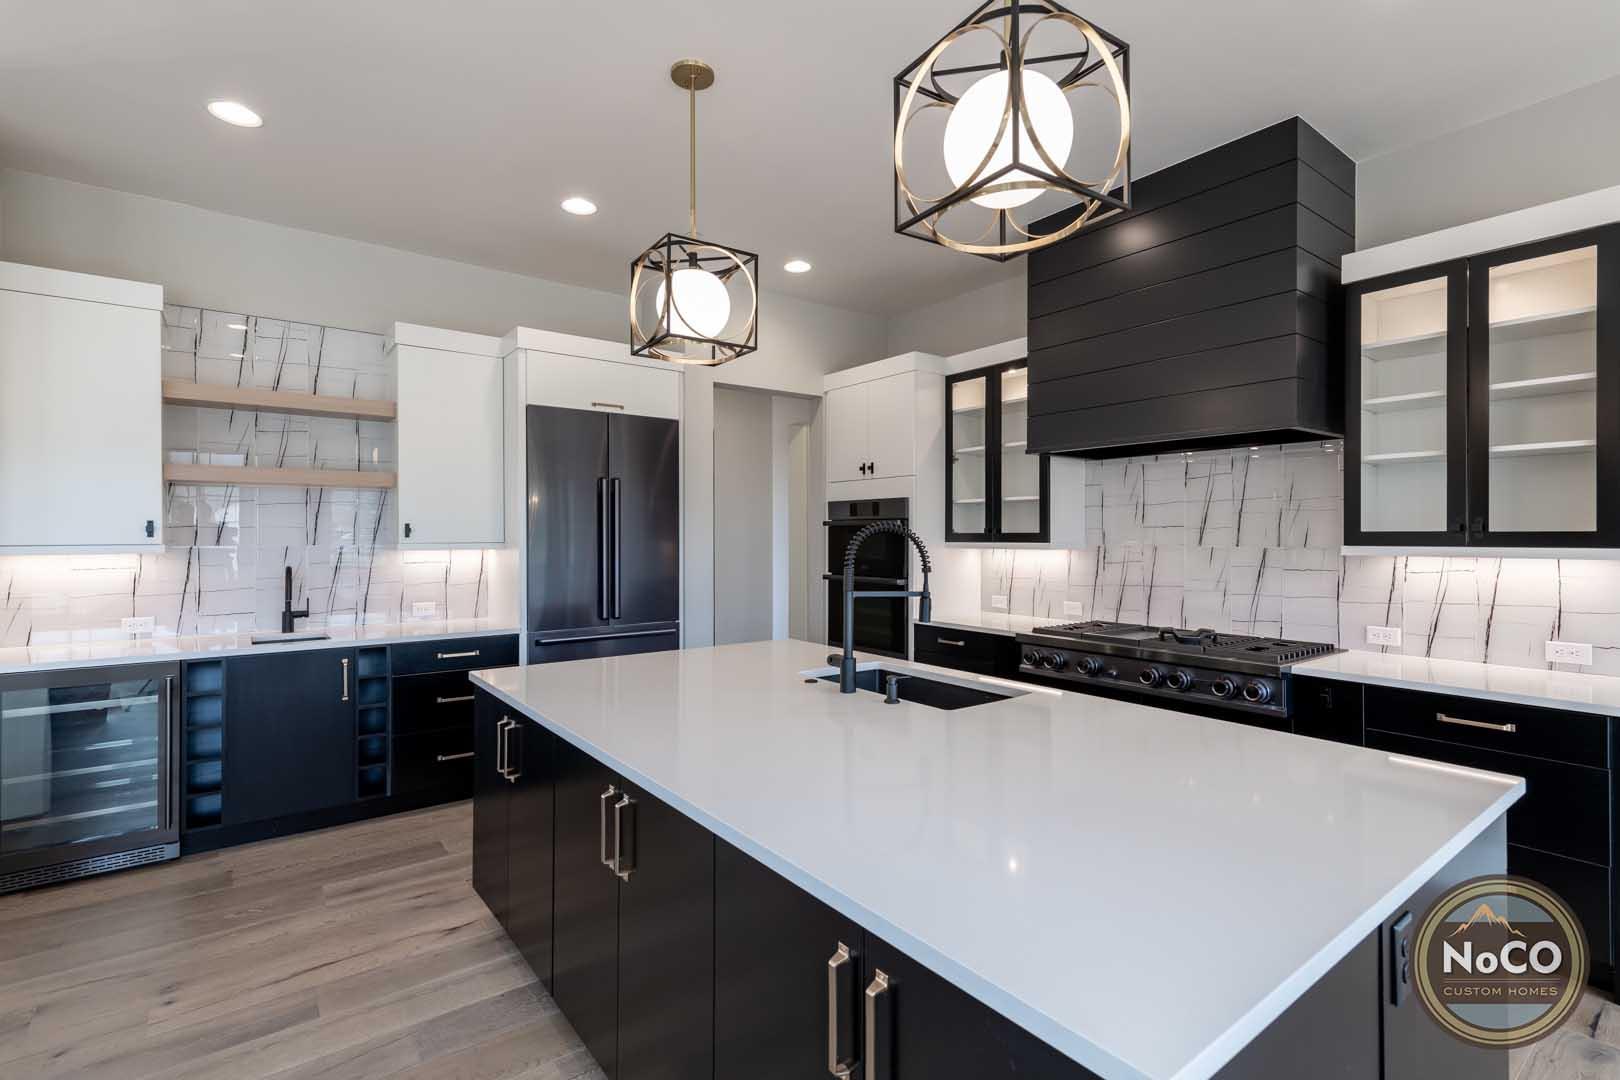 colorado custom home kitchen island